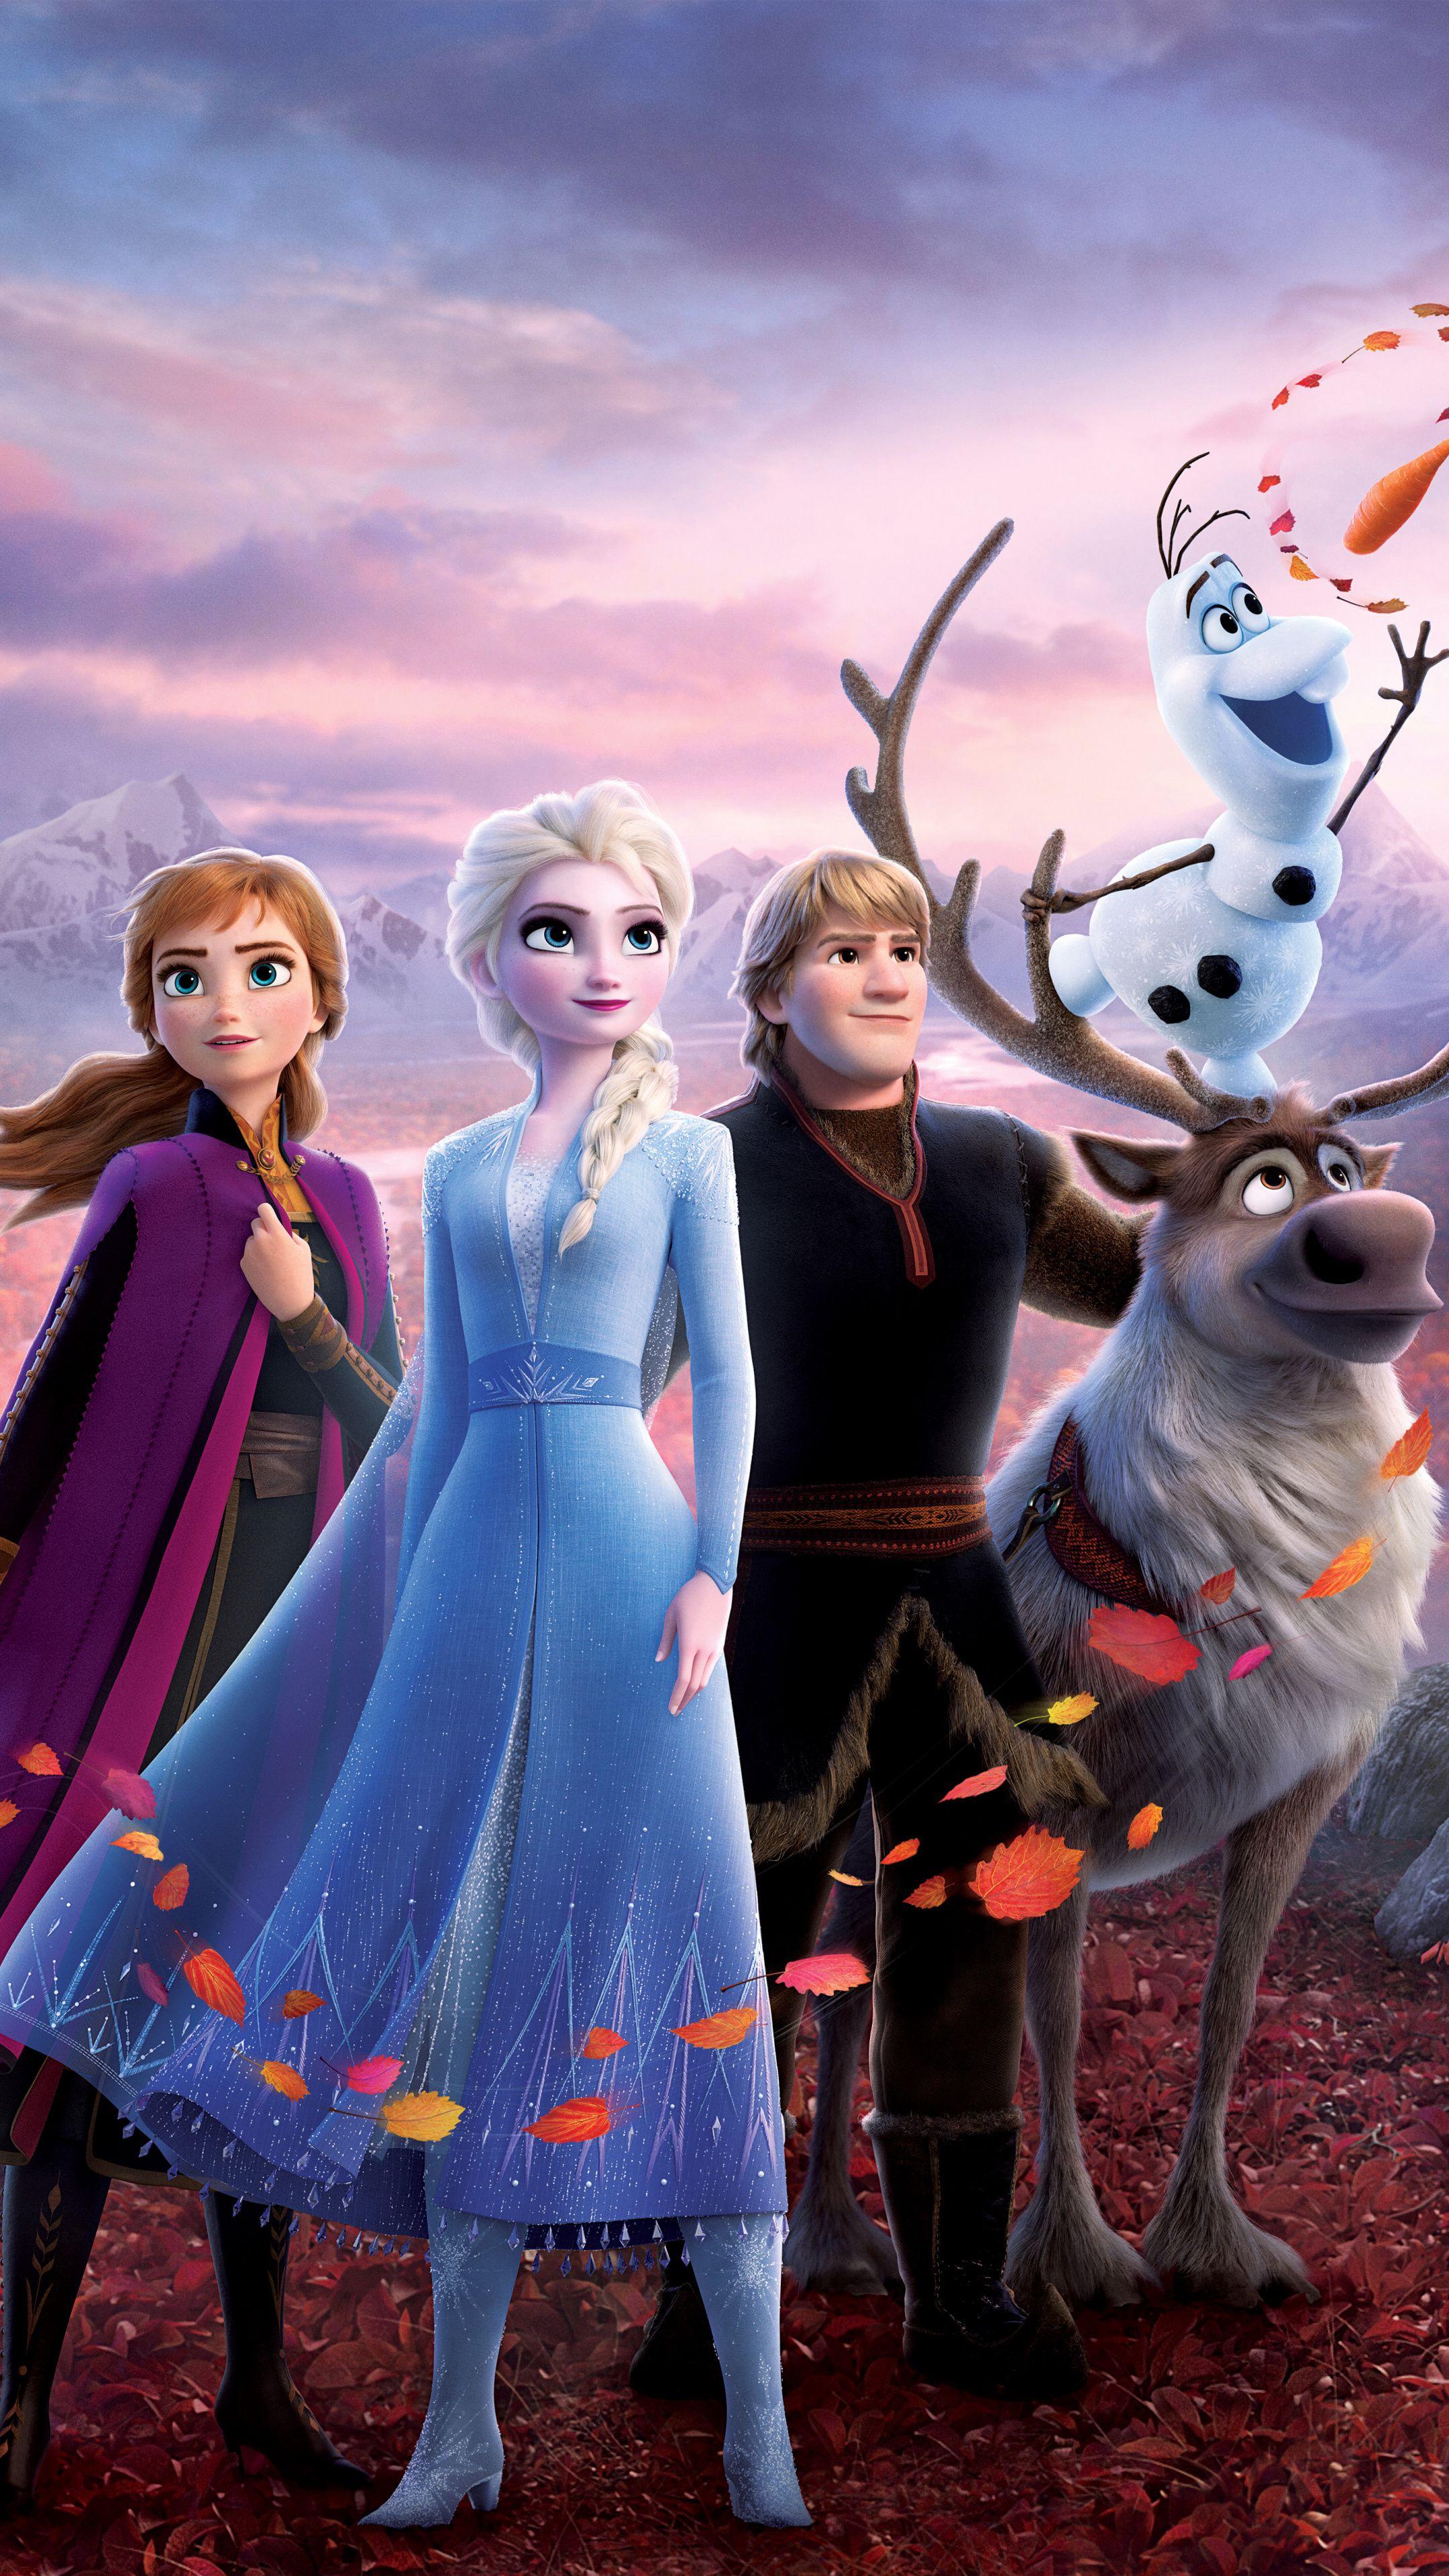 Download 2160x3840 Wallpaper Movie Disney S Animation Movie Frozen 2 Sisters 4k Sony Desenhos De Princesa Da Disney Disney Posteres De Filmes Disney Fofa